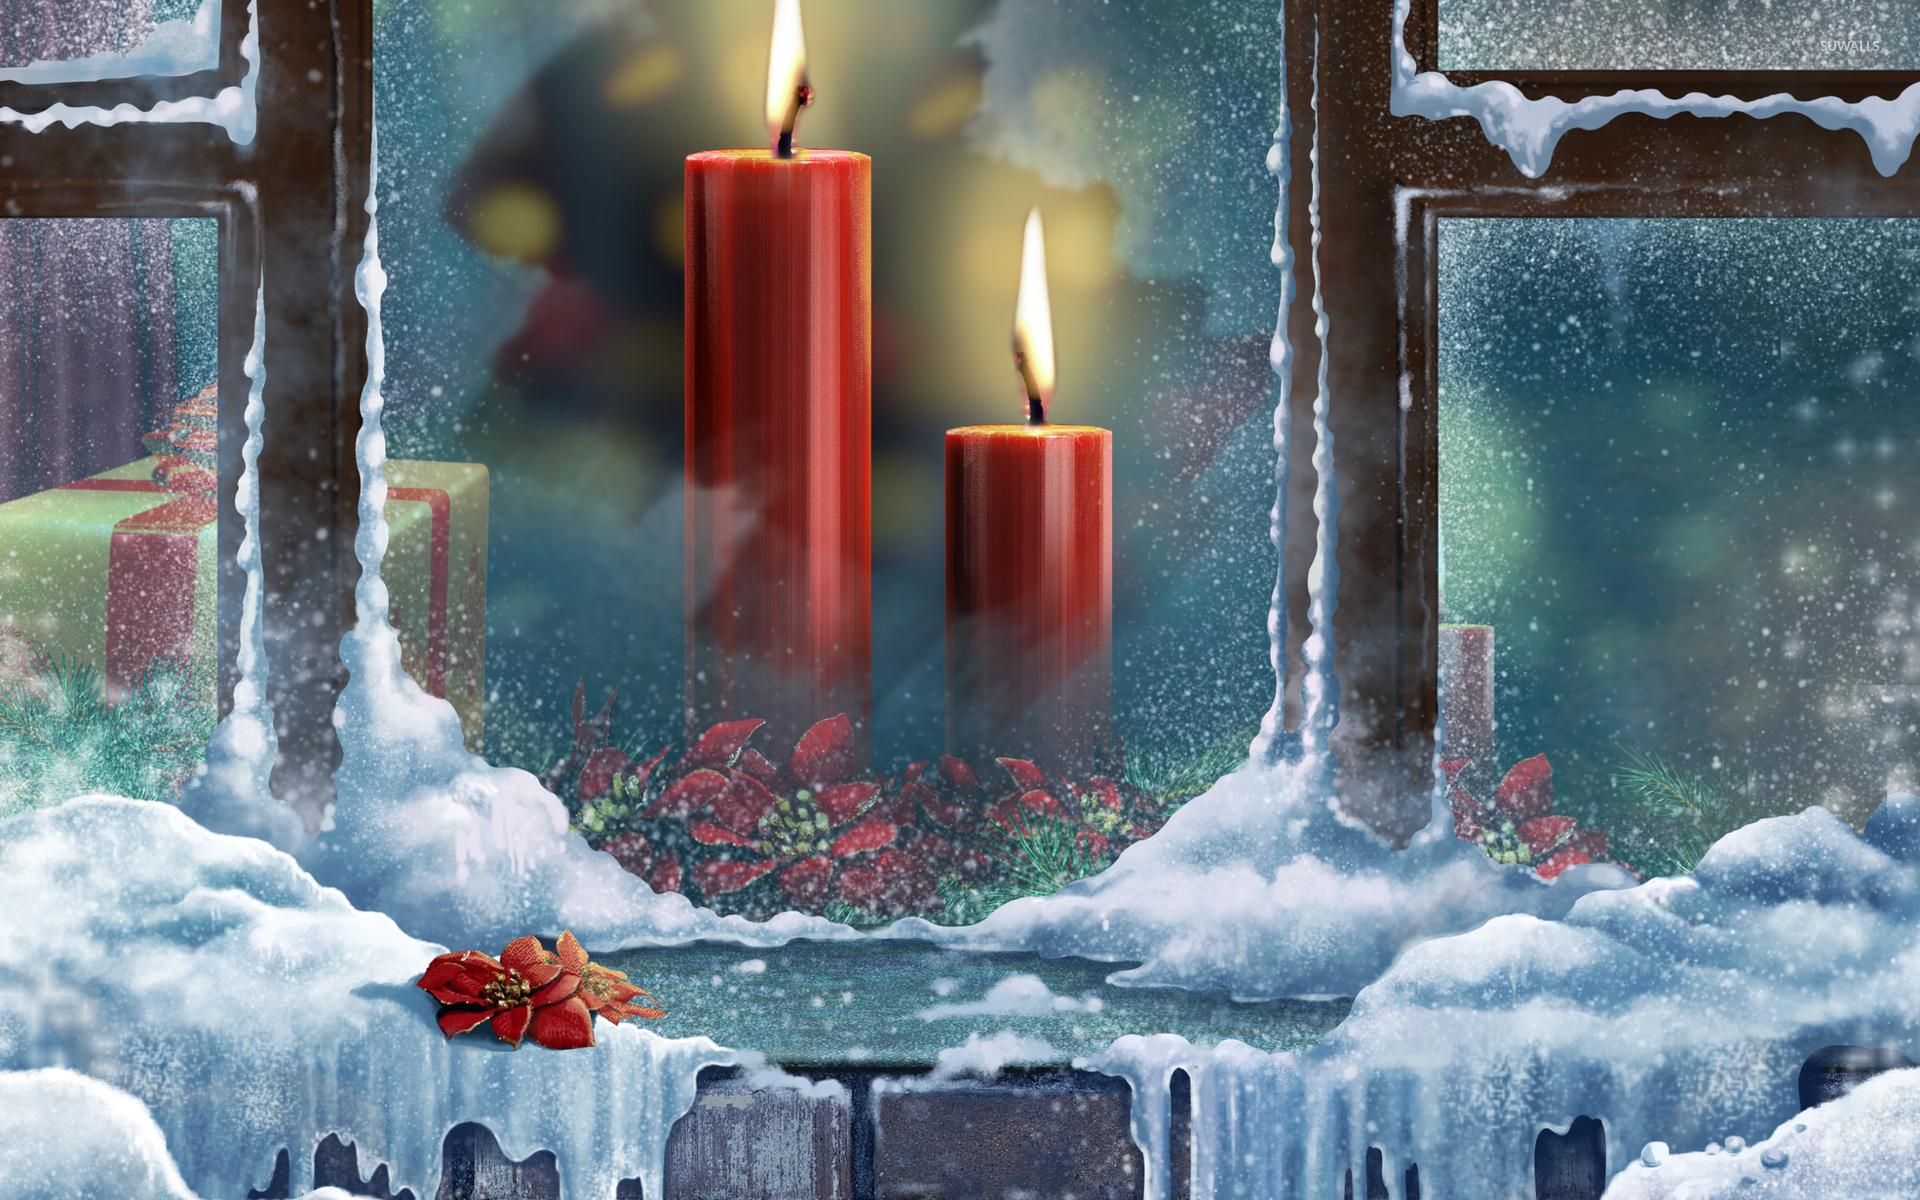 Christmas candles [4] wallpaper - Holiday wallpapers - #38125